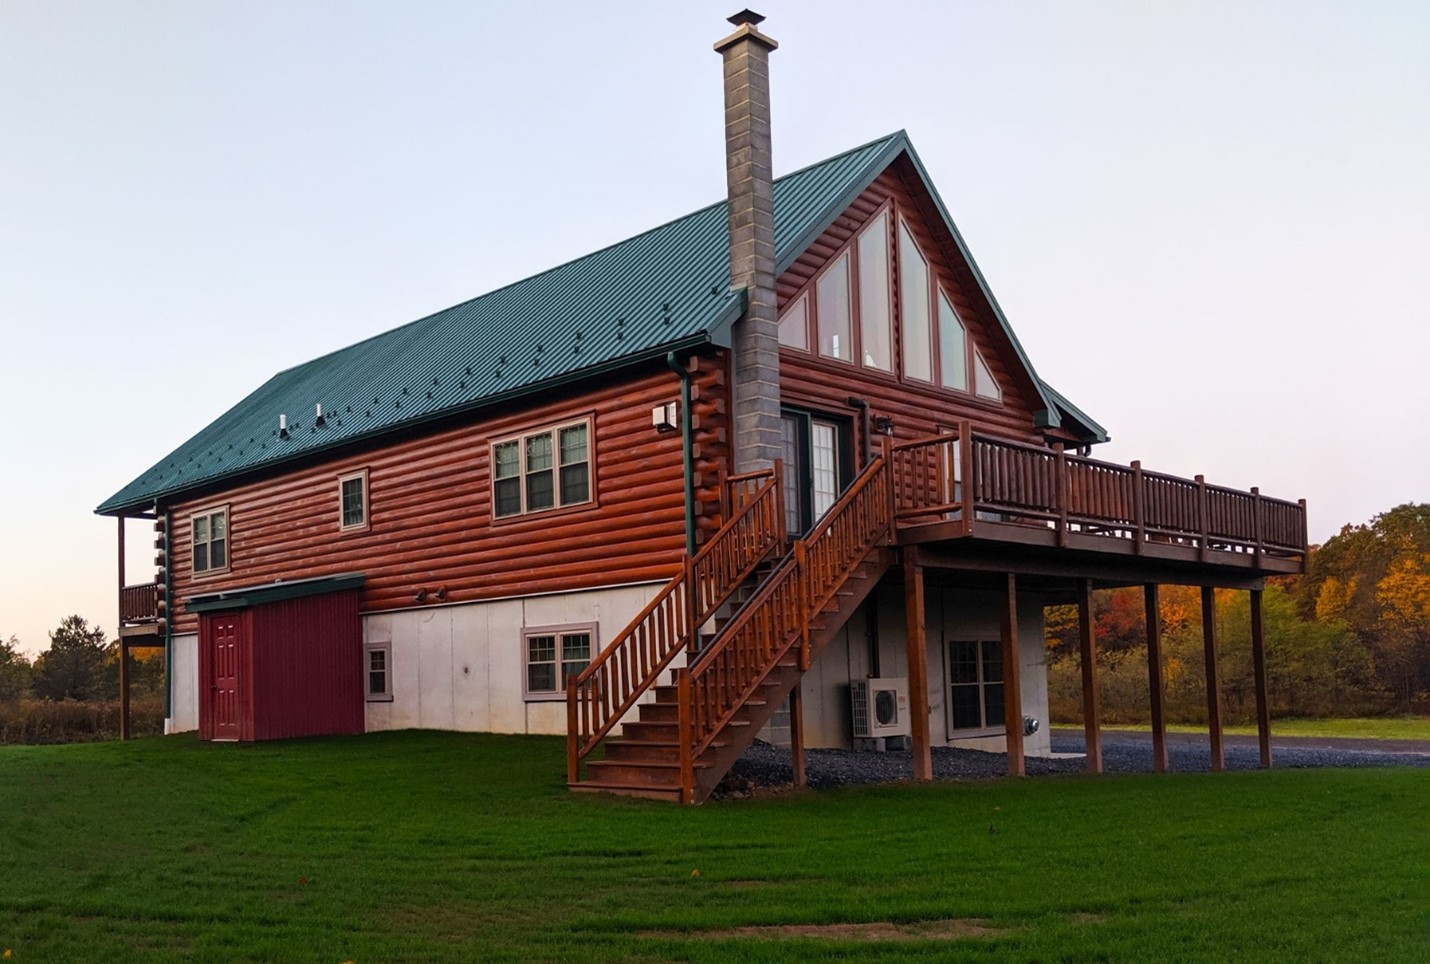 Chalet Cabin in Silverthornbe Colorado